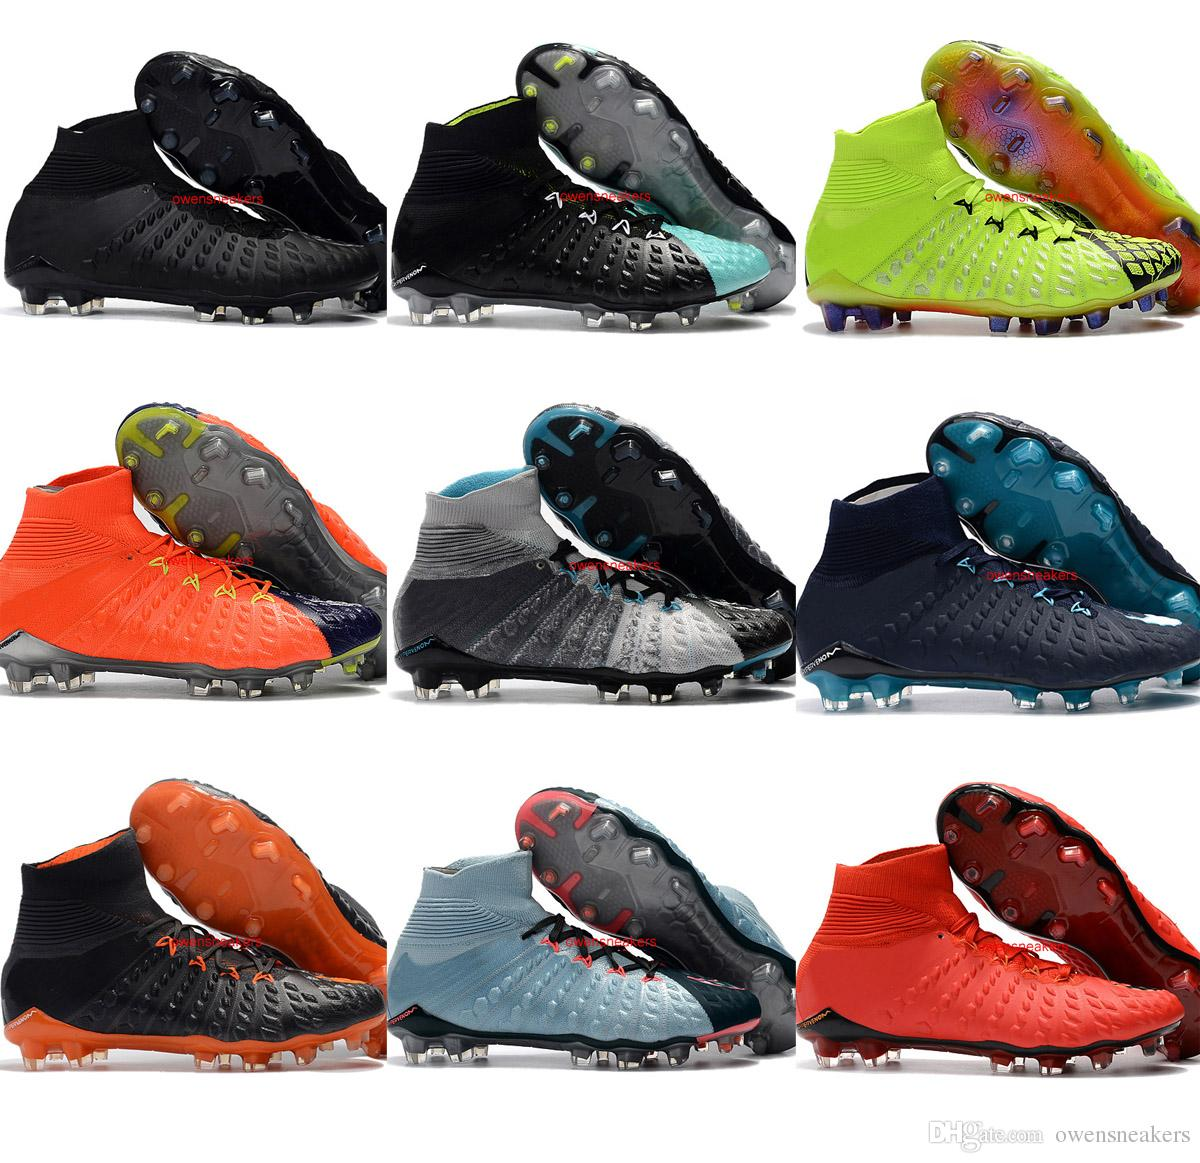 quality design b7884 b4197 Mens High Top Football Boots Hypervenom Phantom III DF FG Soccer Shoes  MagistaX Superfly Outdoor EA Sports Cleats Neymar